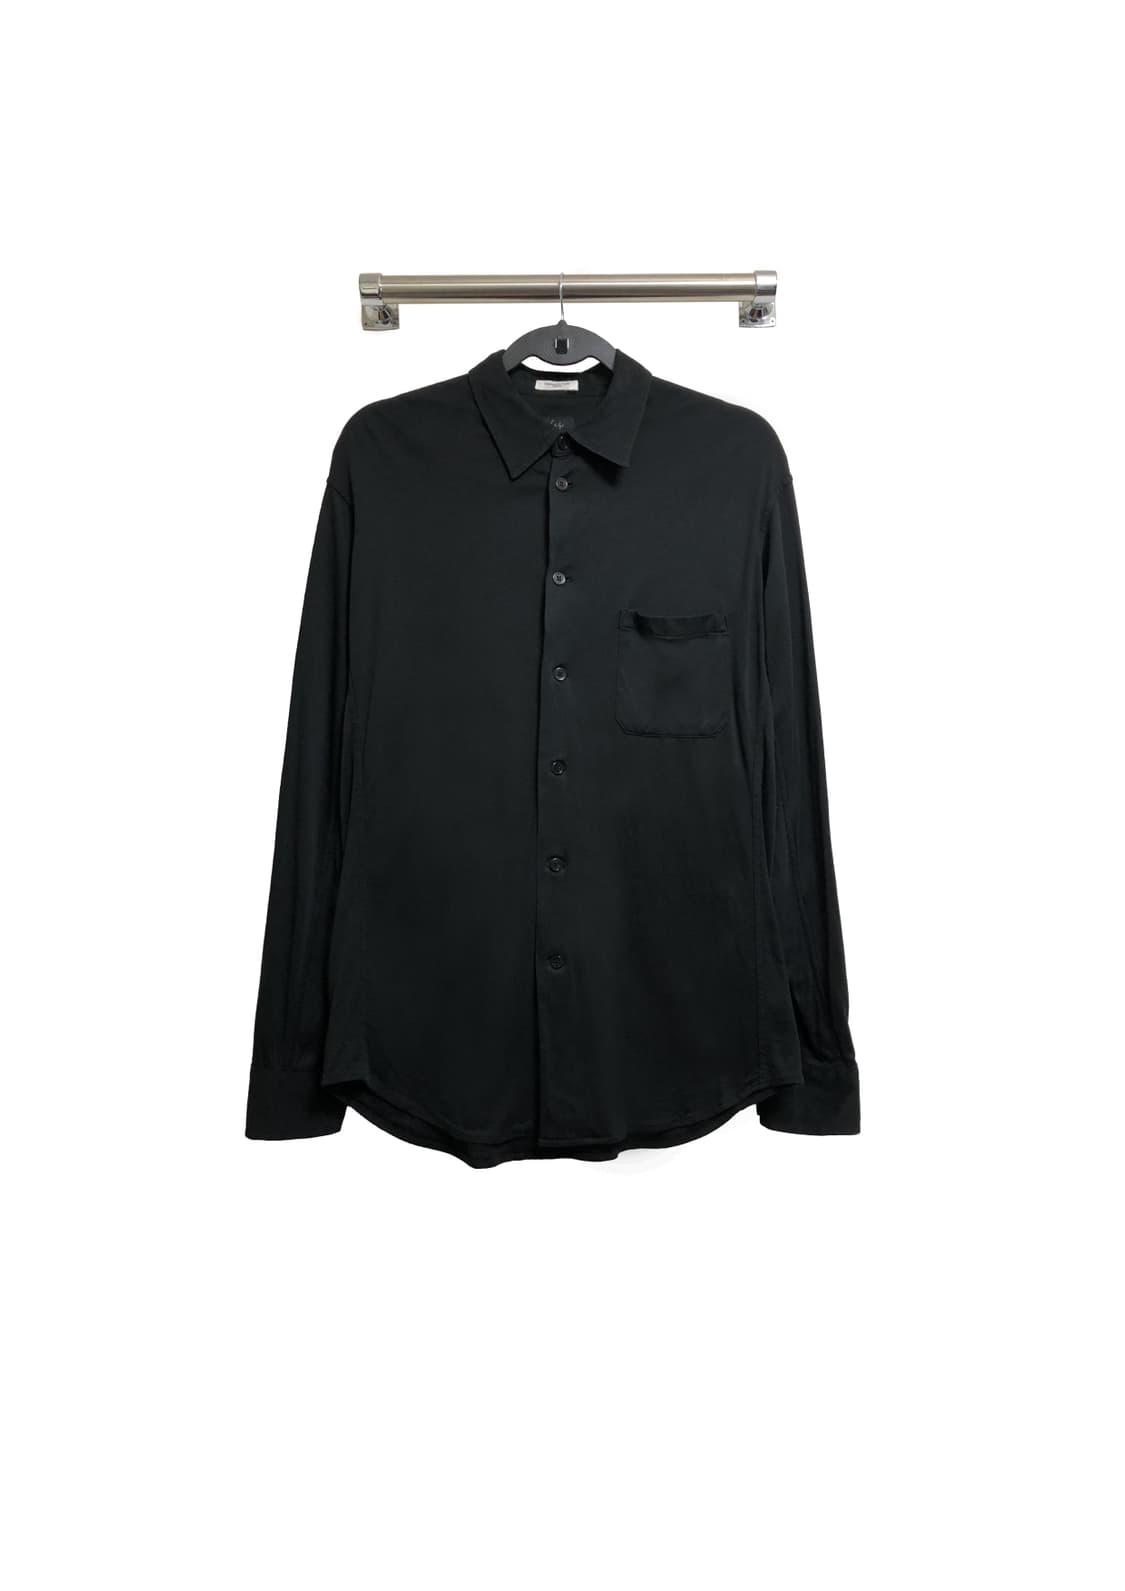 Yohji Yamamoto Costume D'Homme